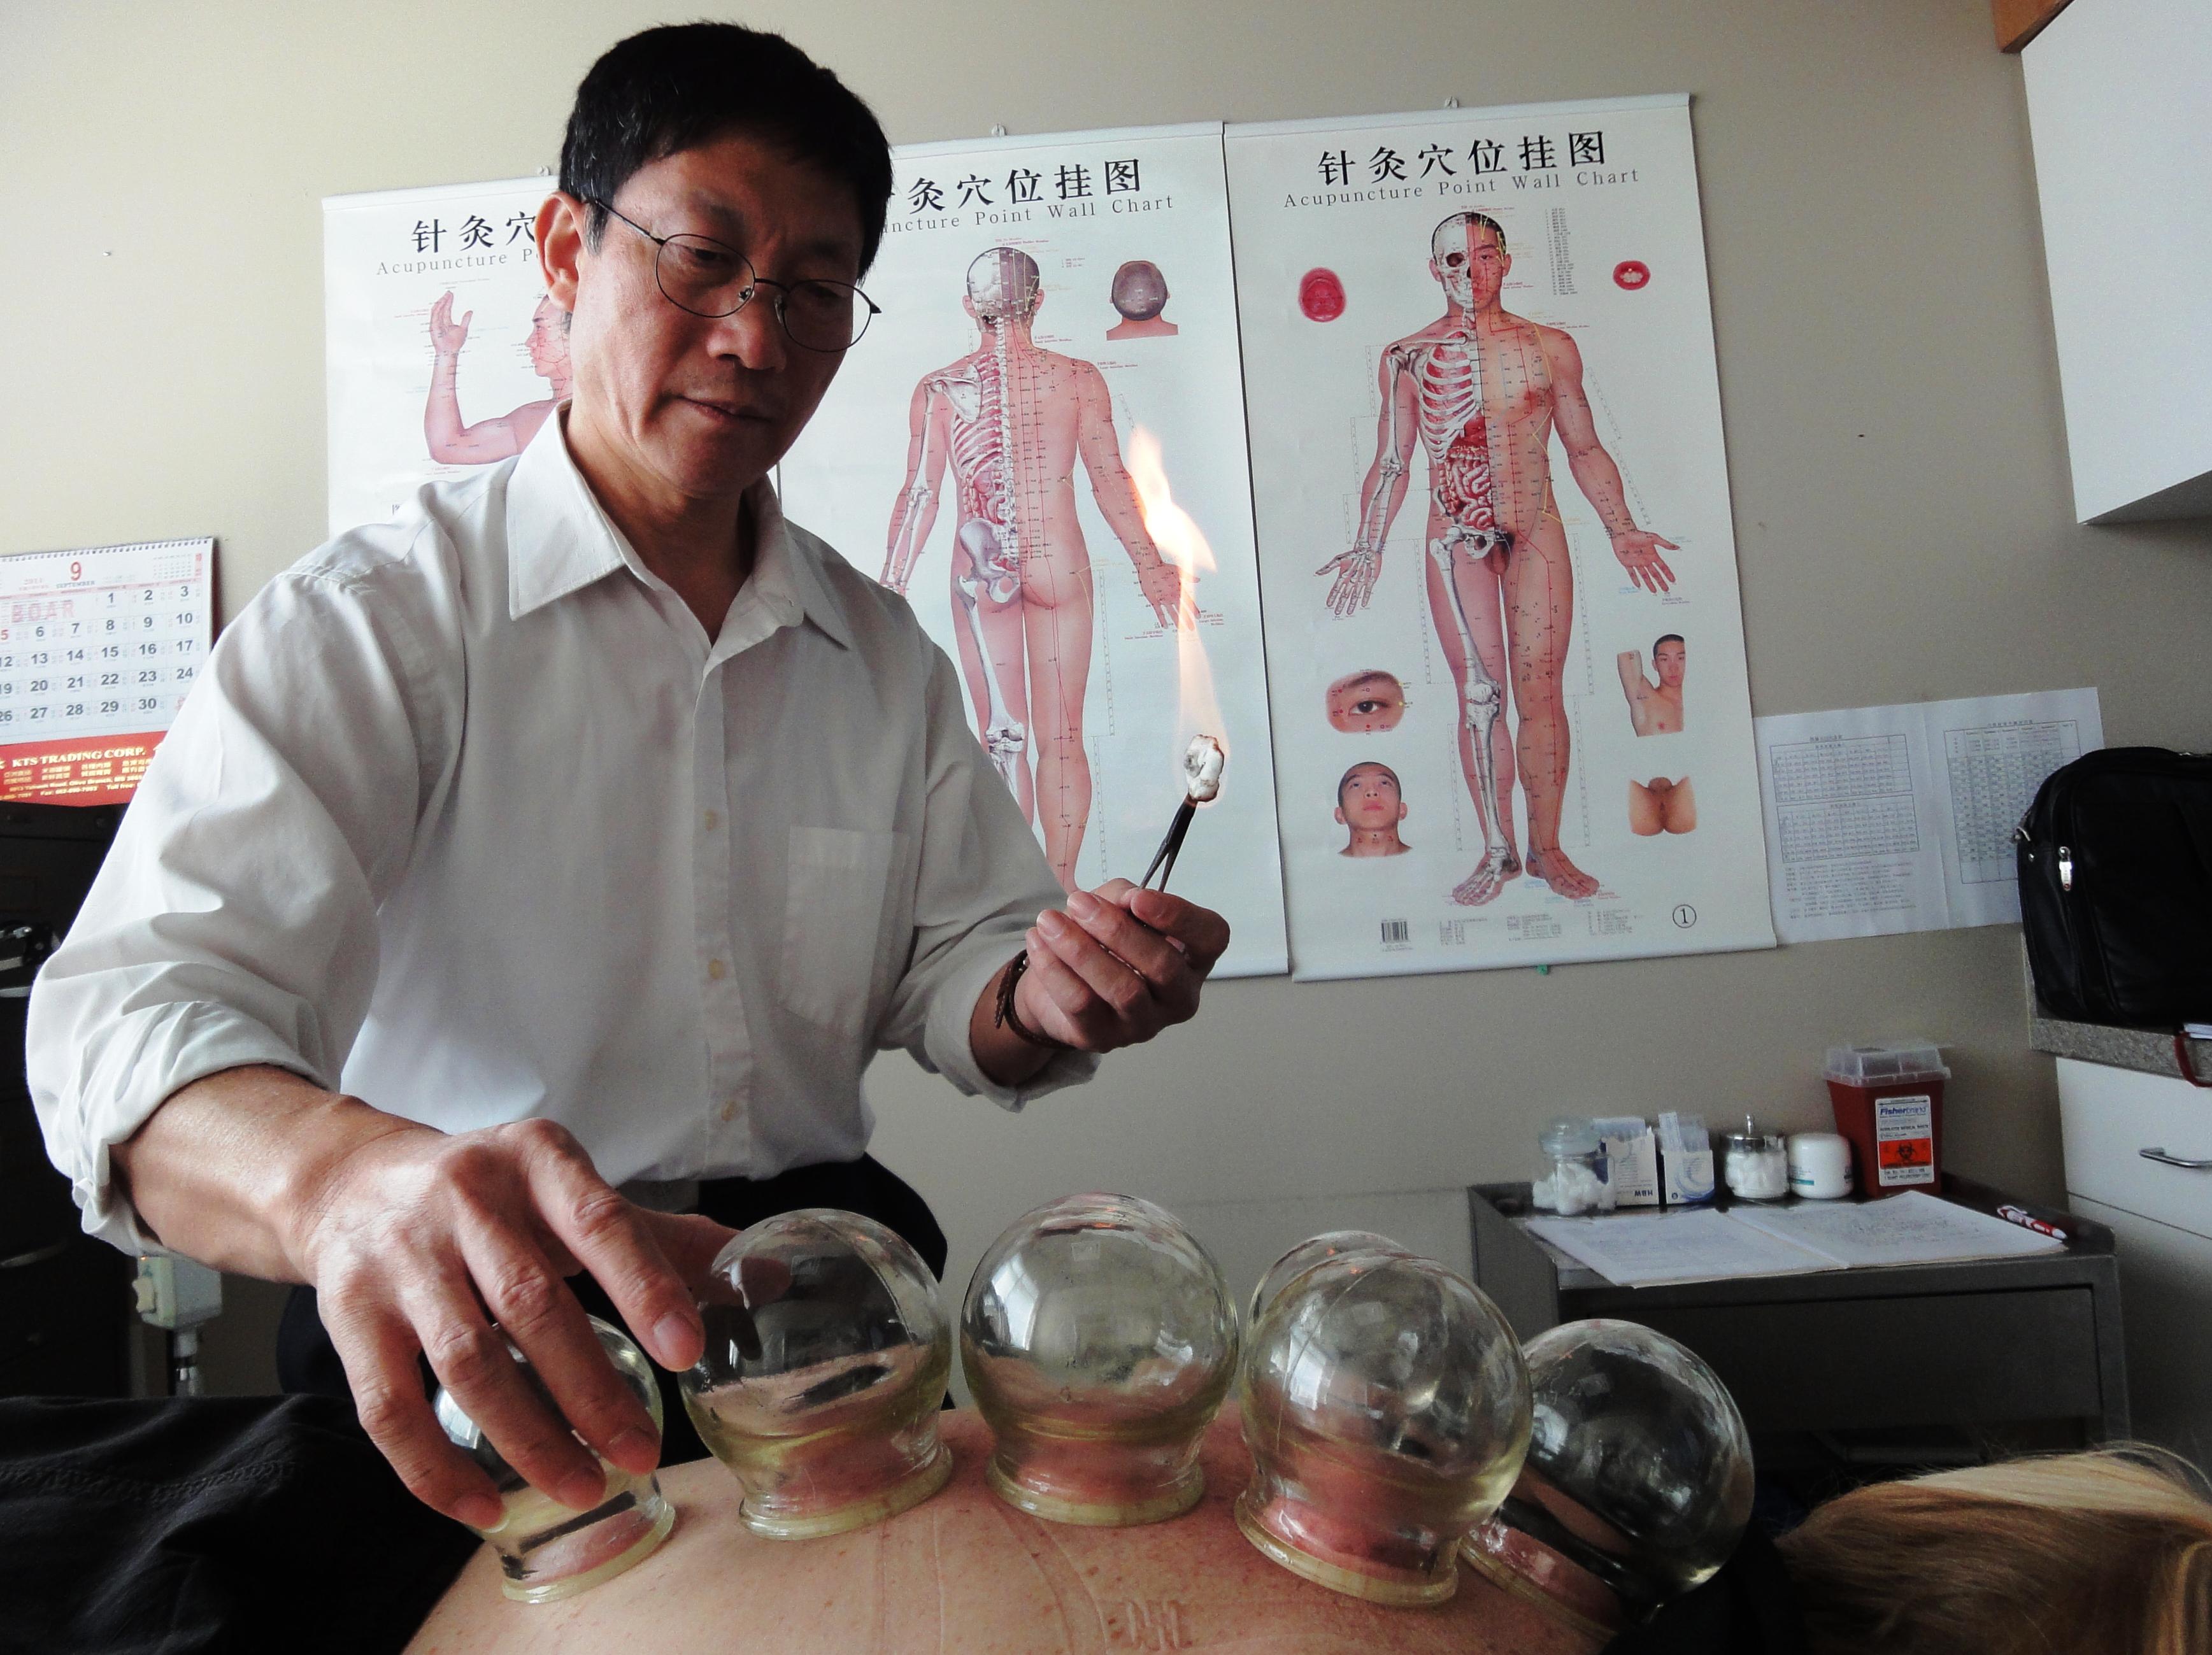 Acupuncture & Chinese Medicine image 4